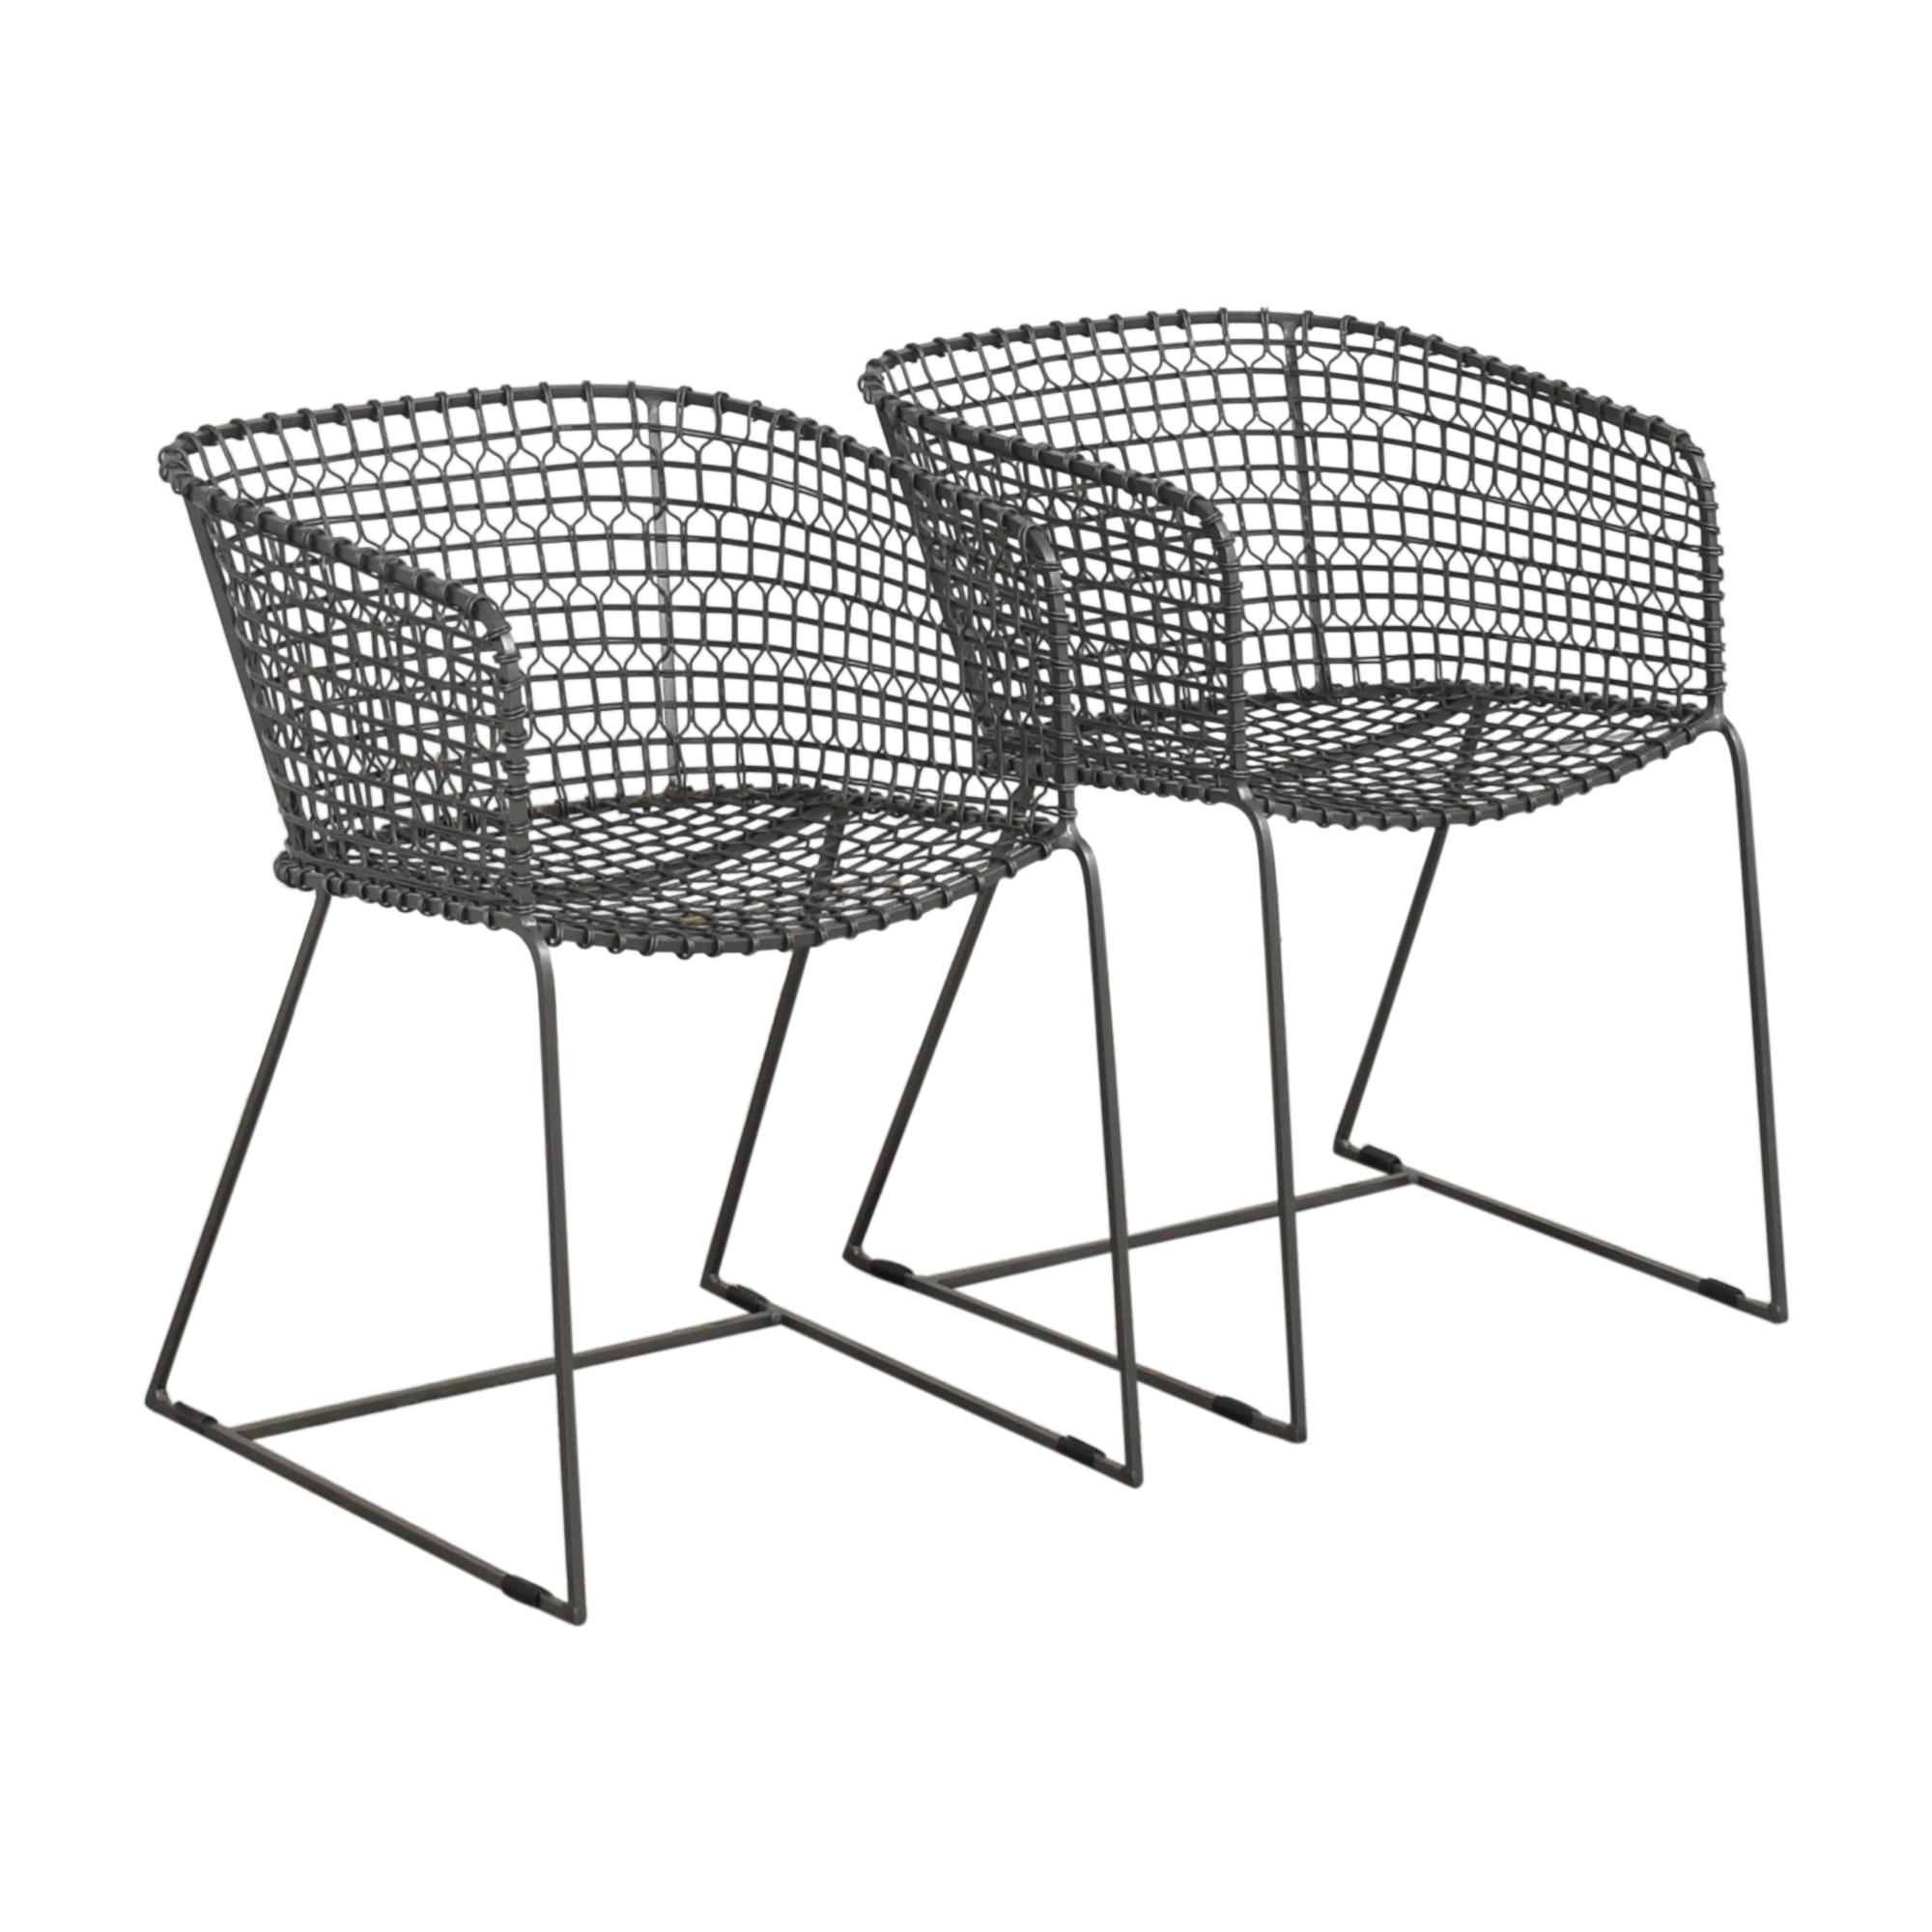 shop Crate & Barrel Tig Barrel Dining Chairs Crate & Barrel Chairs